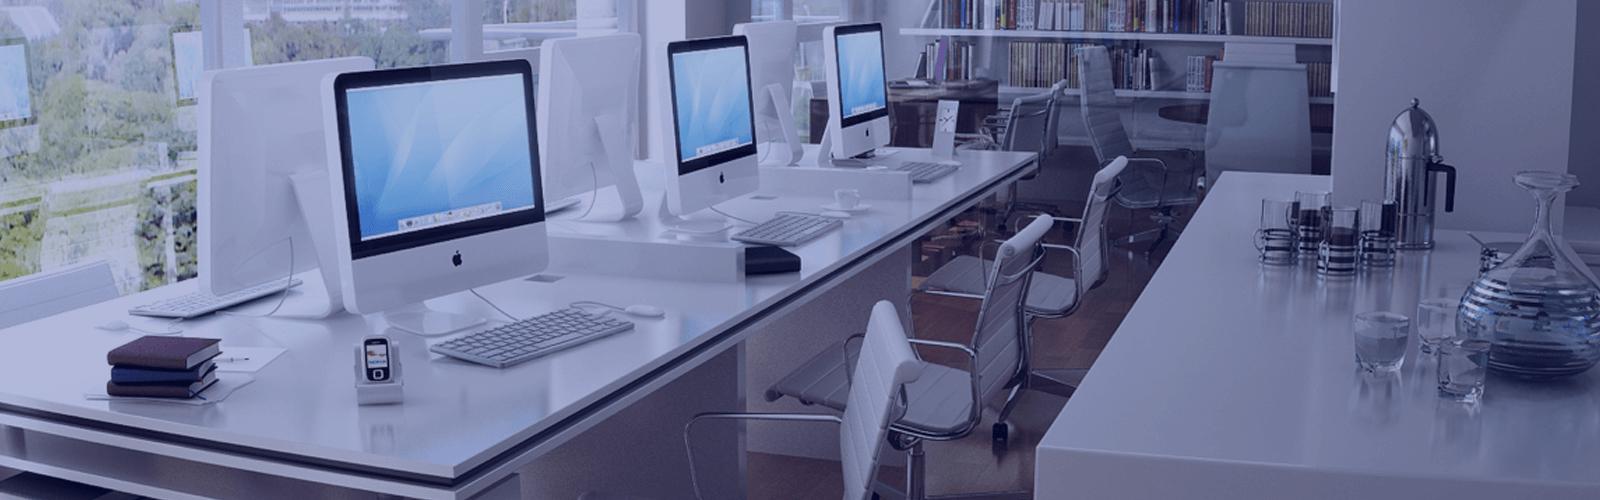 office, computer, desk, openspace